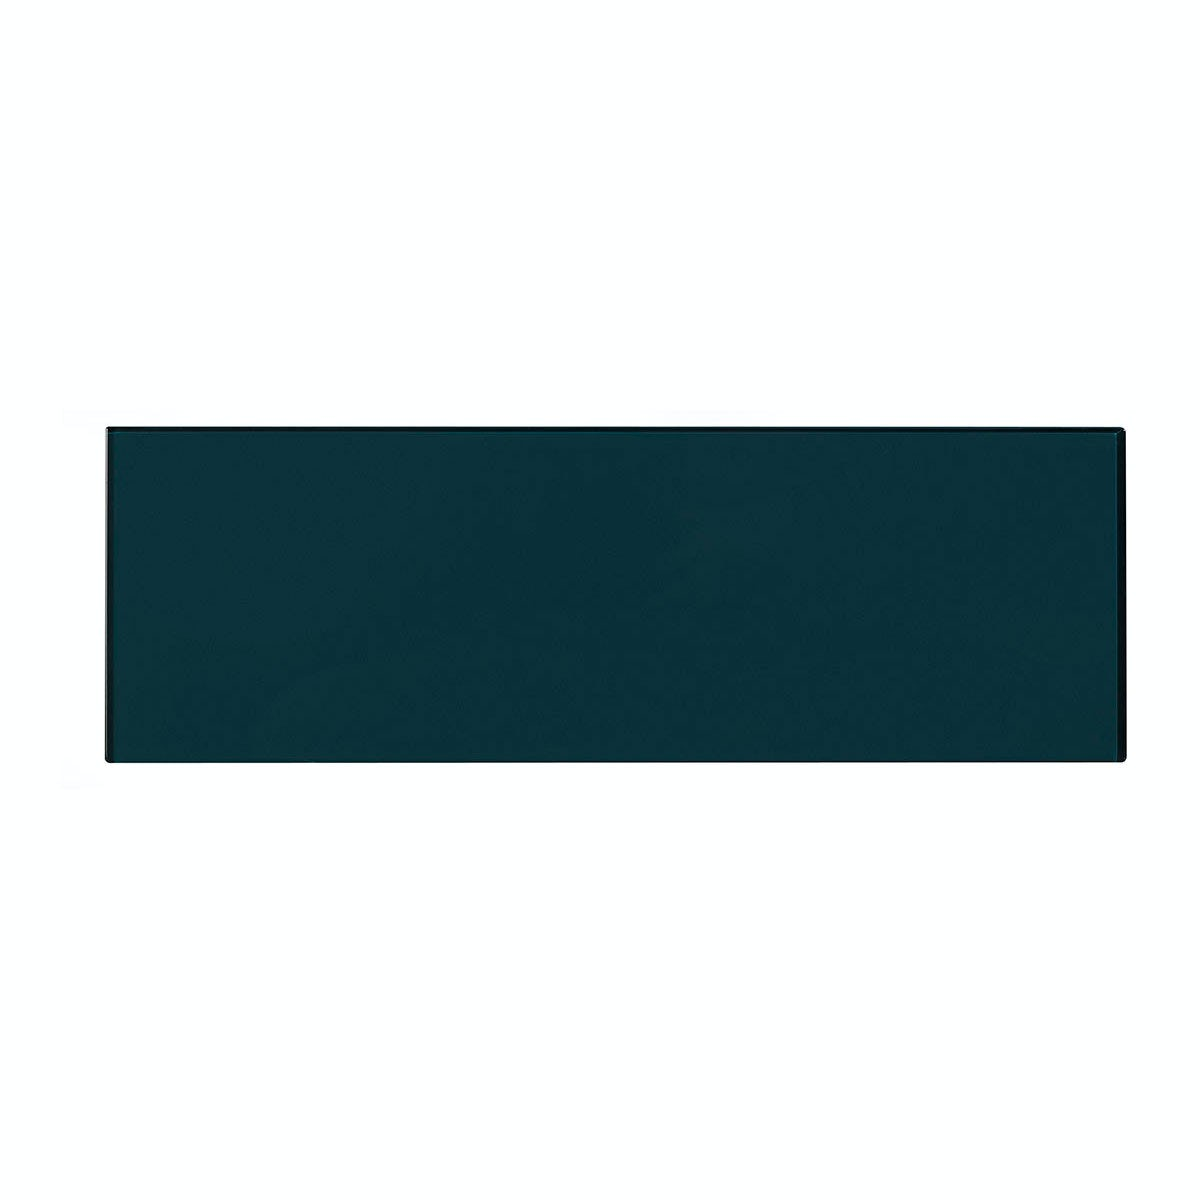 British Ceramic Tile glass petrol tile 148mm x 448mm - Box of 5